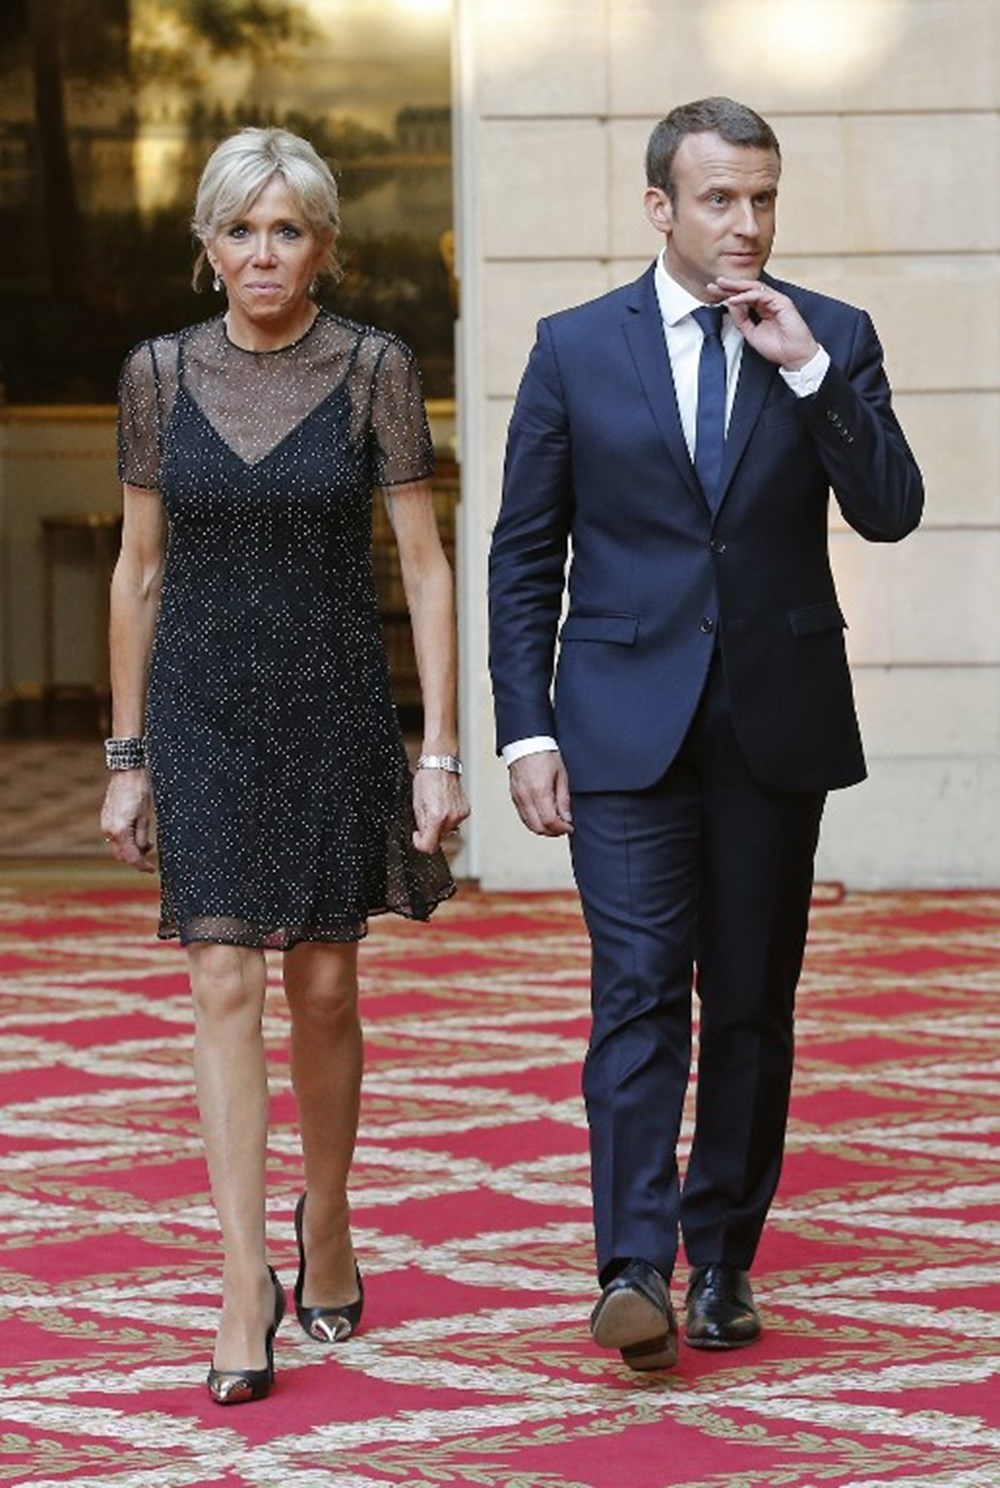 Brigitte Macron Un Giyim Tarzina Karsi Imza Kampanyasi Baslatildi Magazin Haberleri Ntv